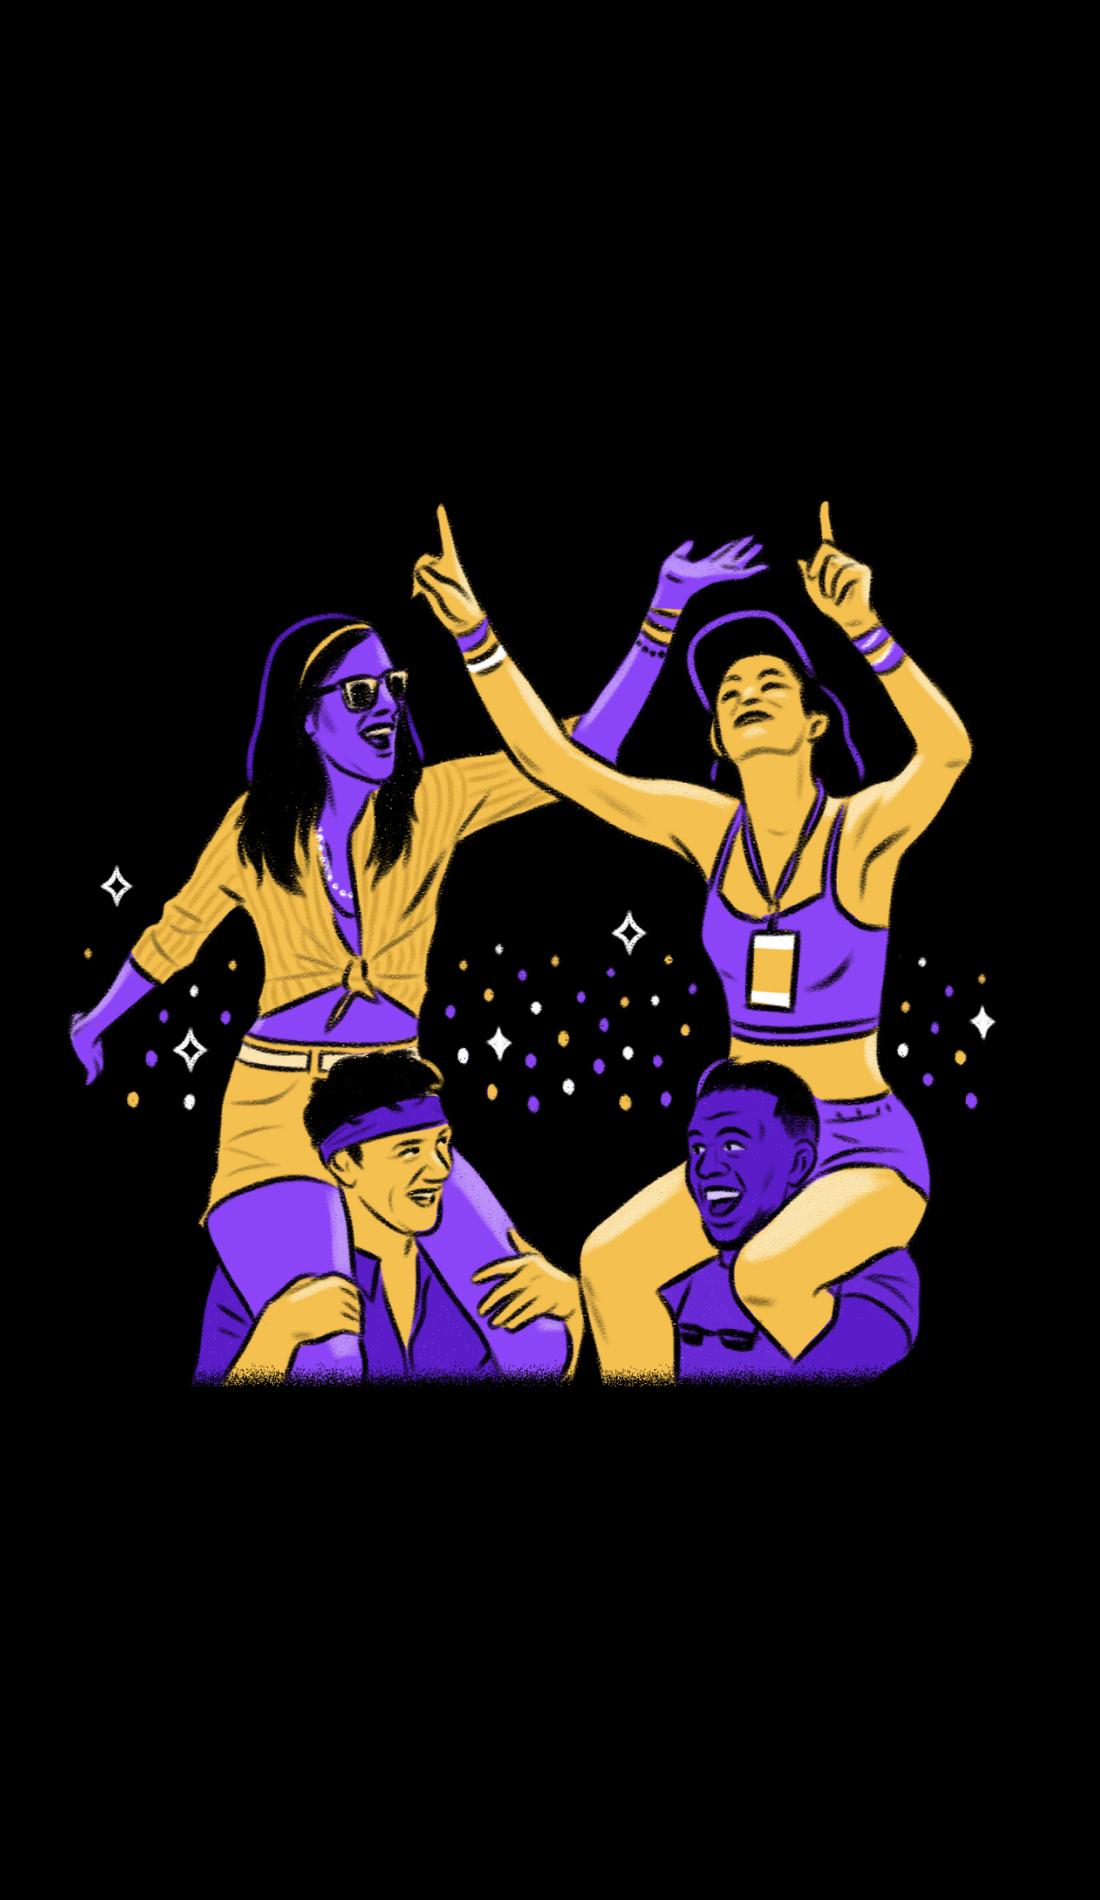 A KCon live event